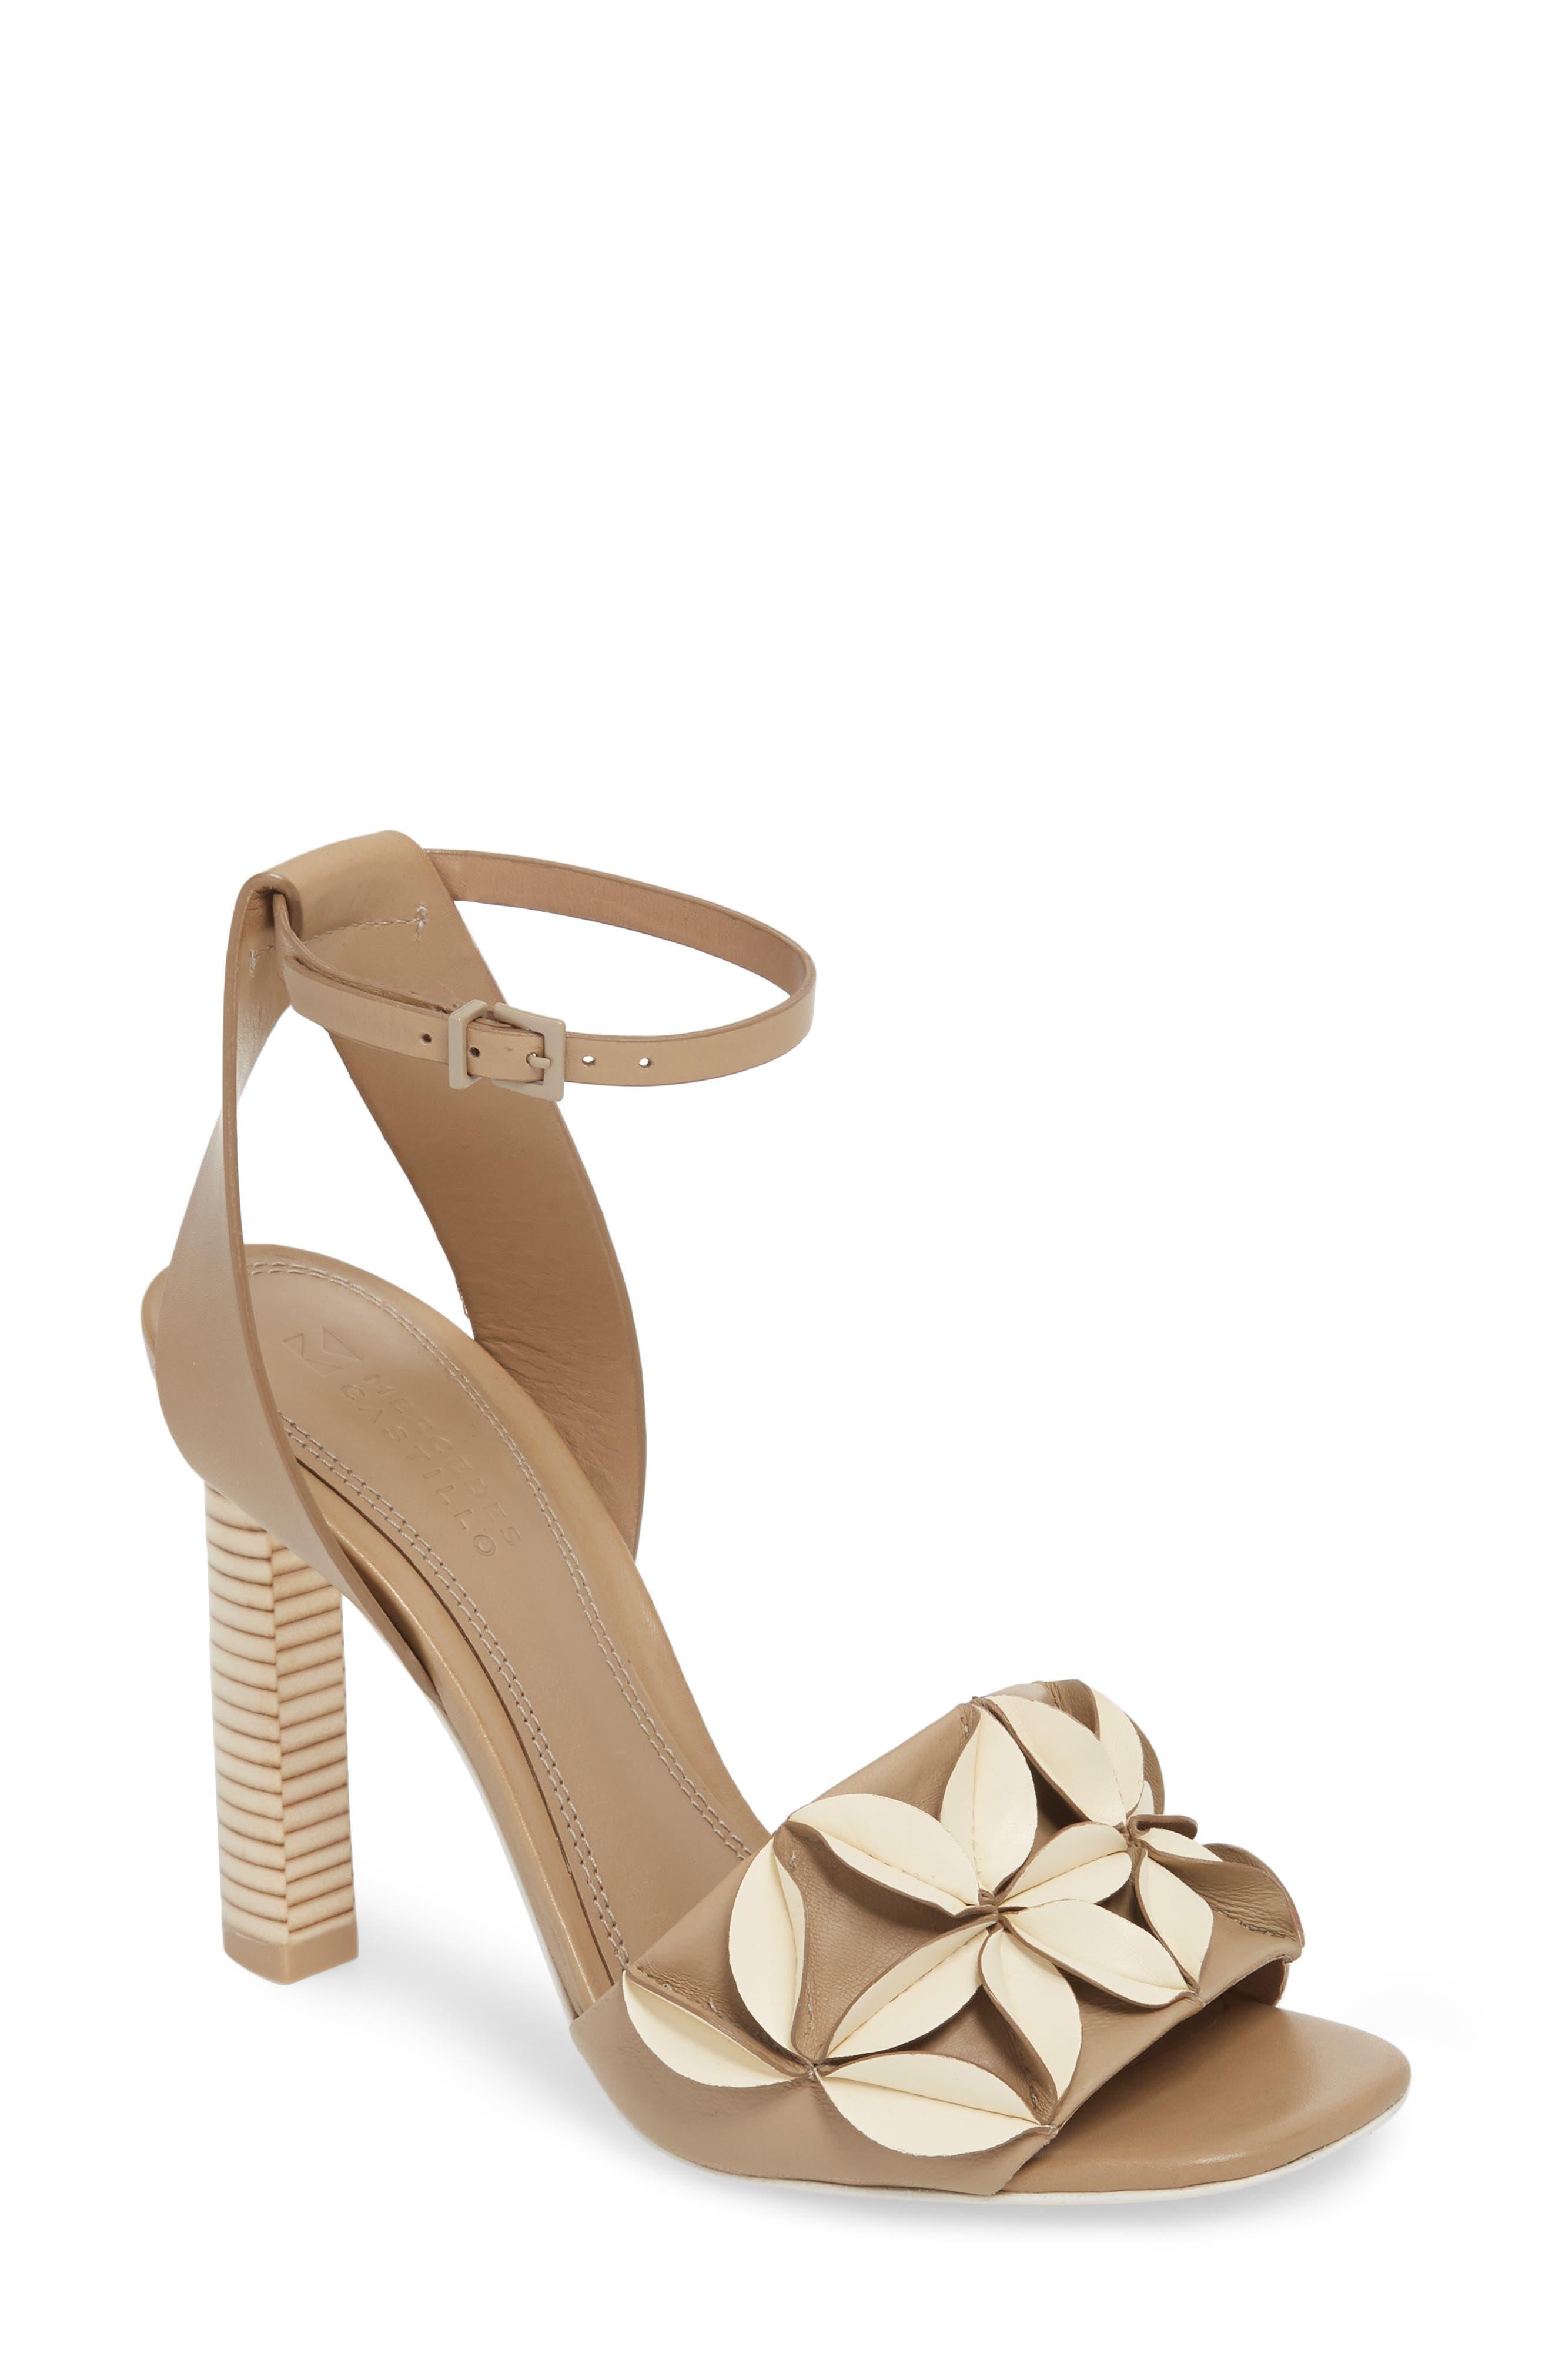 Milee Ankle Strap Sandal,                             Main thumbnail 1, color,                             250